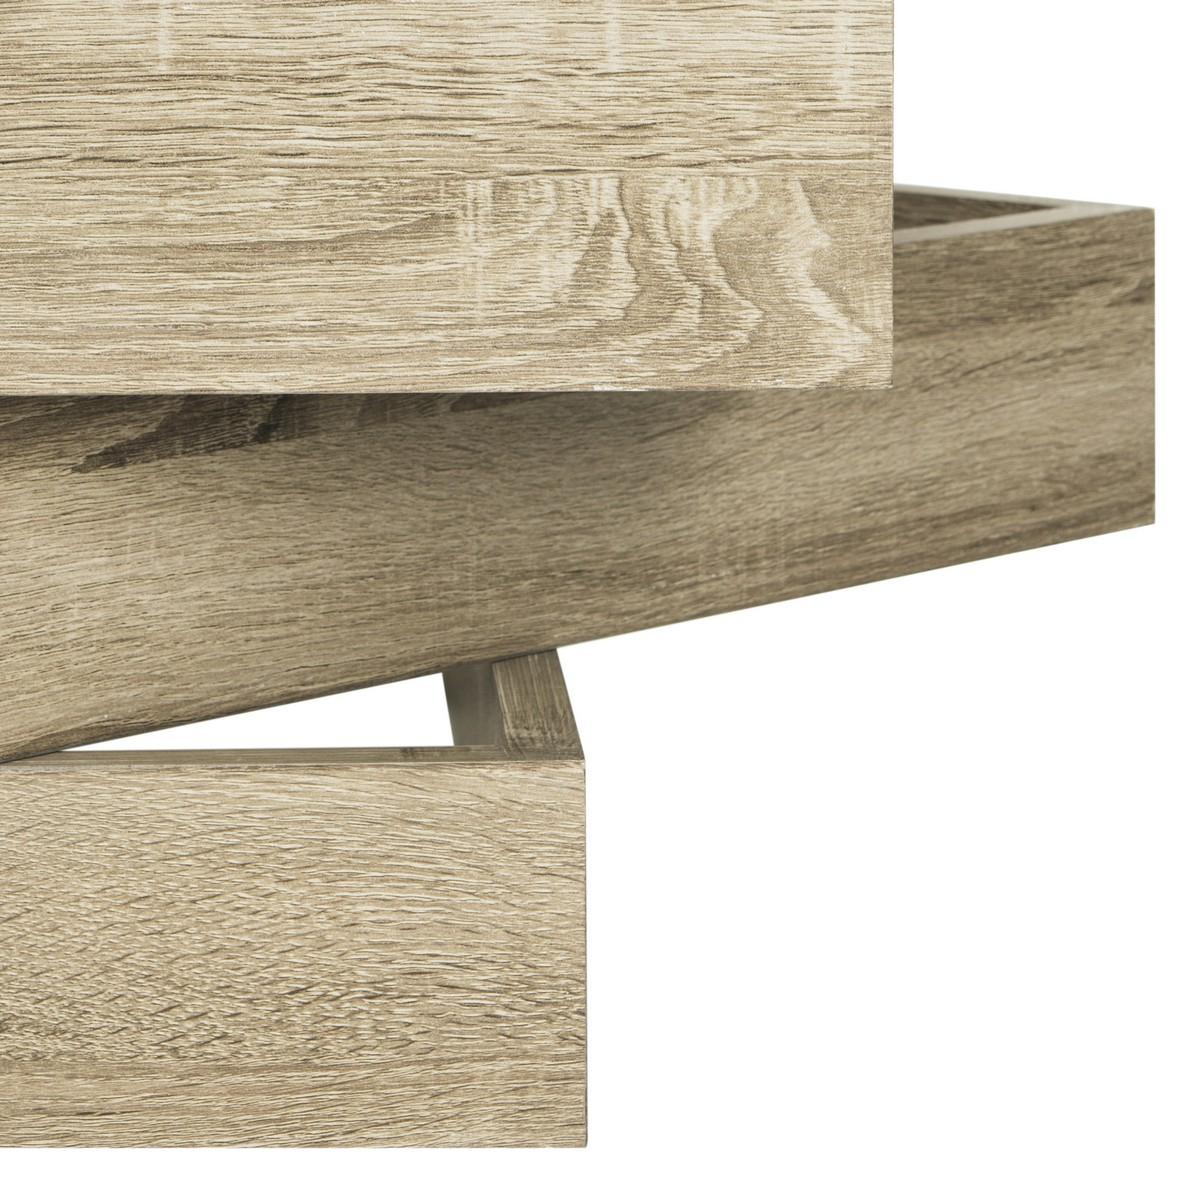 Fox4250a Coffee Tables – Furnituresafavieh Throughout Fashionable Safavieh Anwen Geometric Wood Coffee Tables (View 9 of 20)